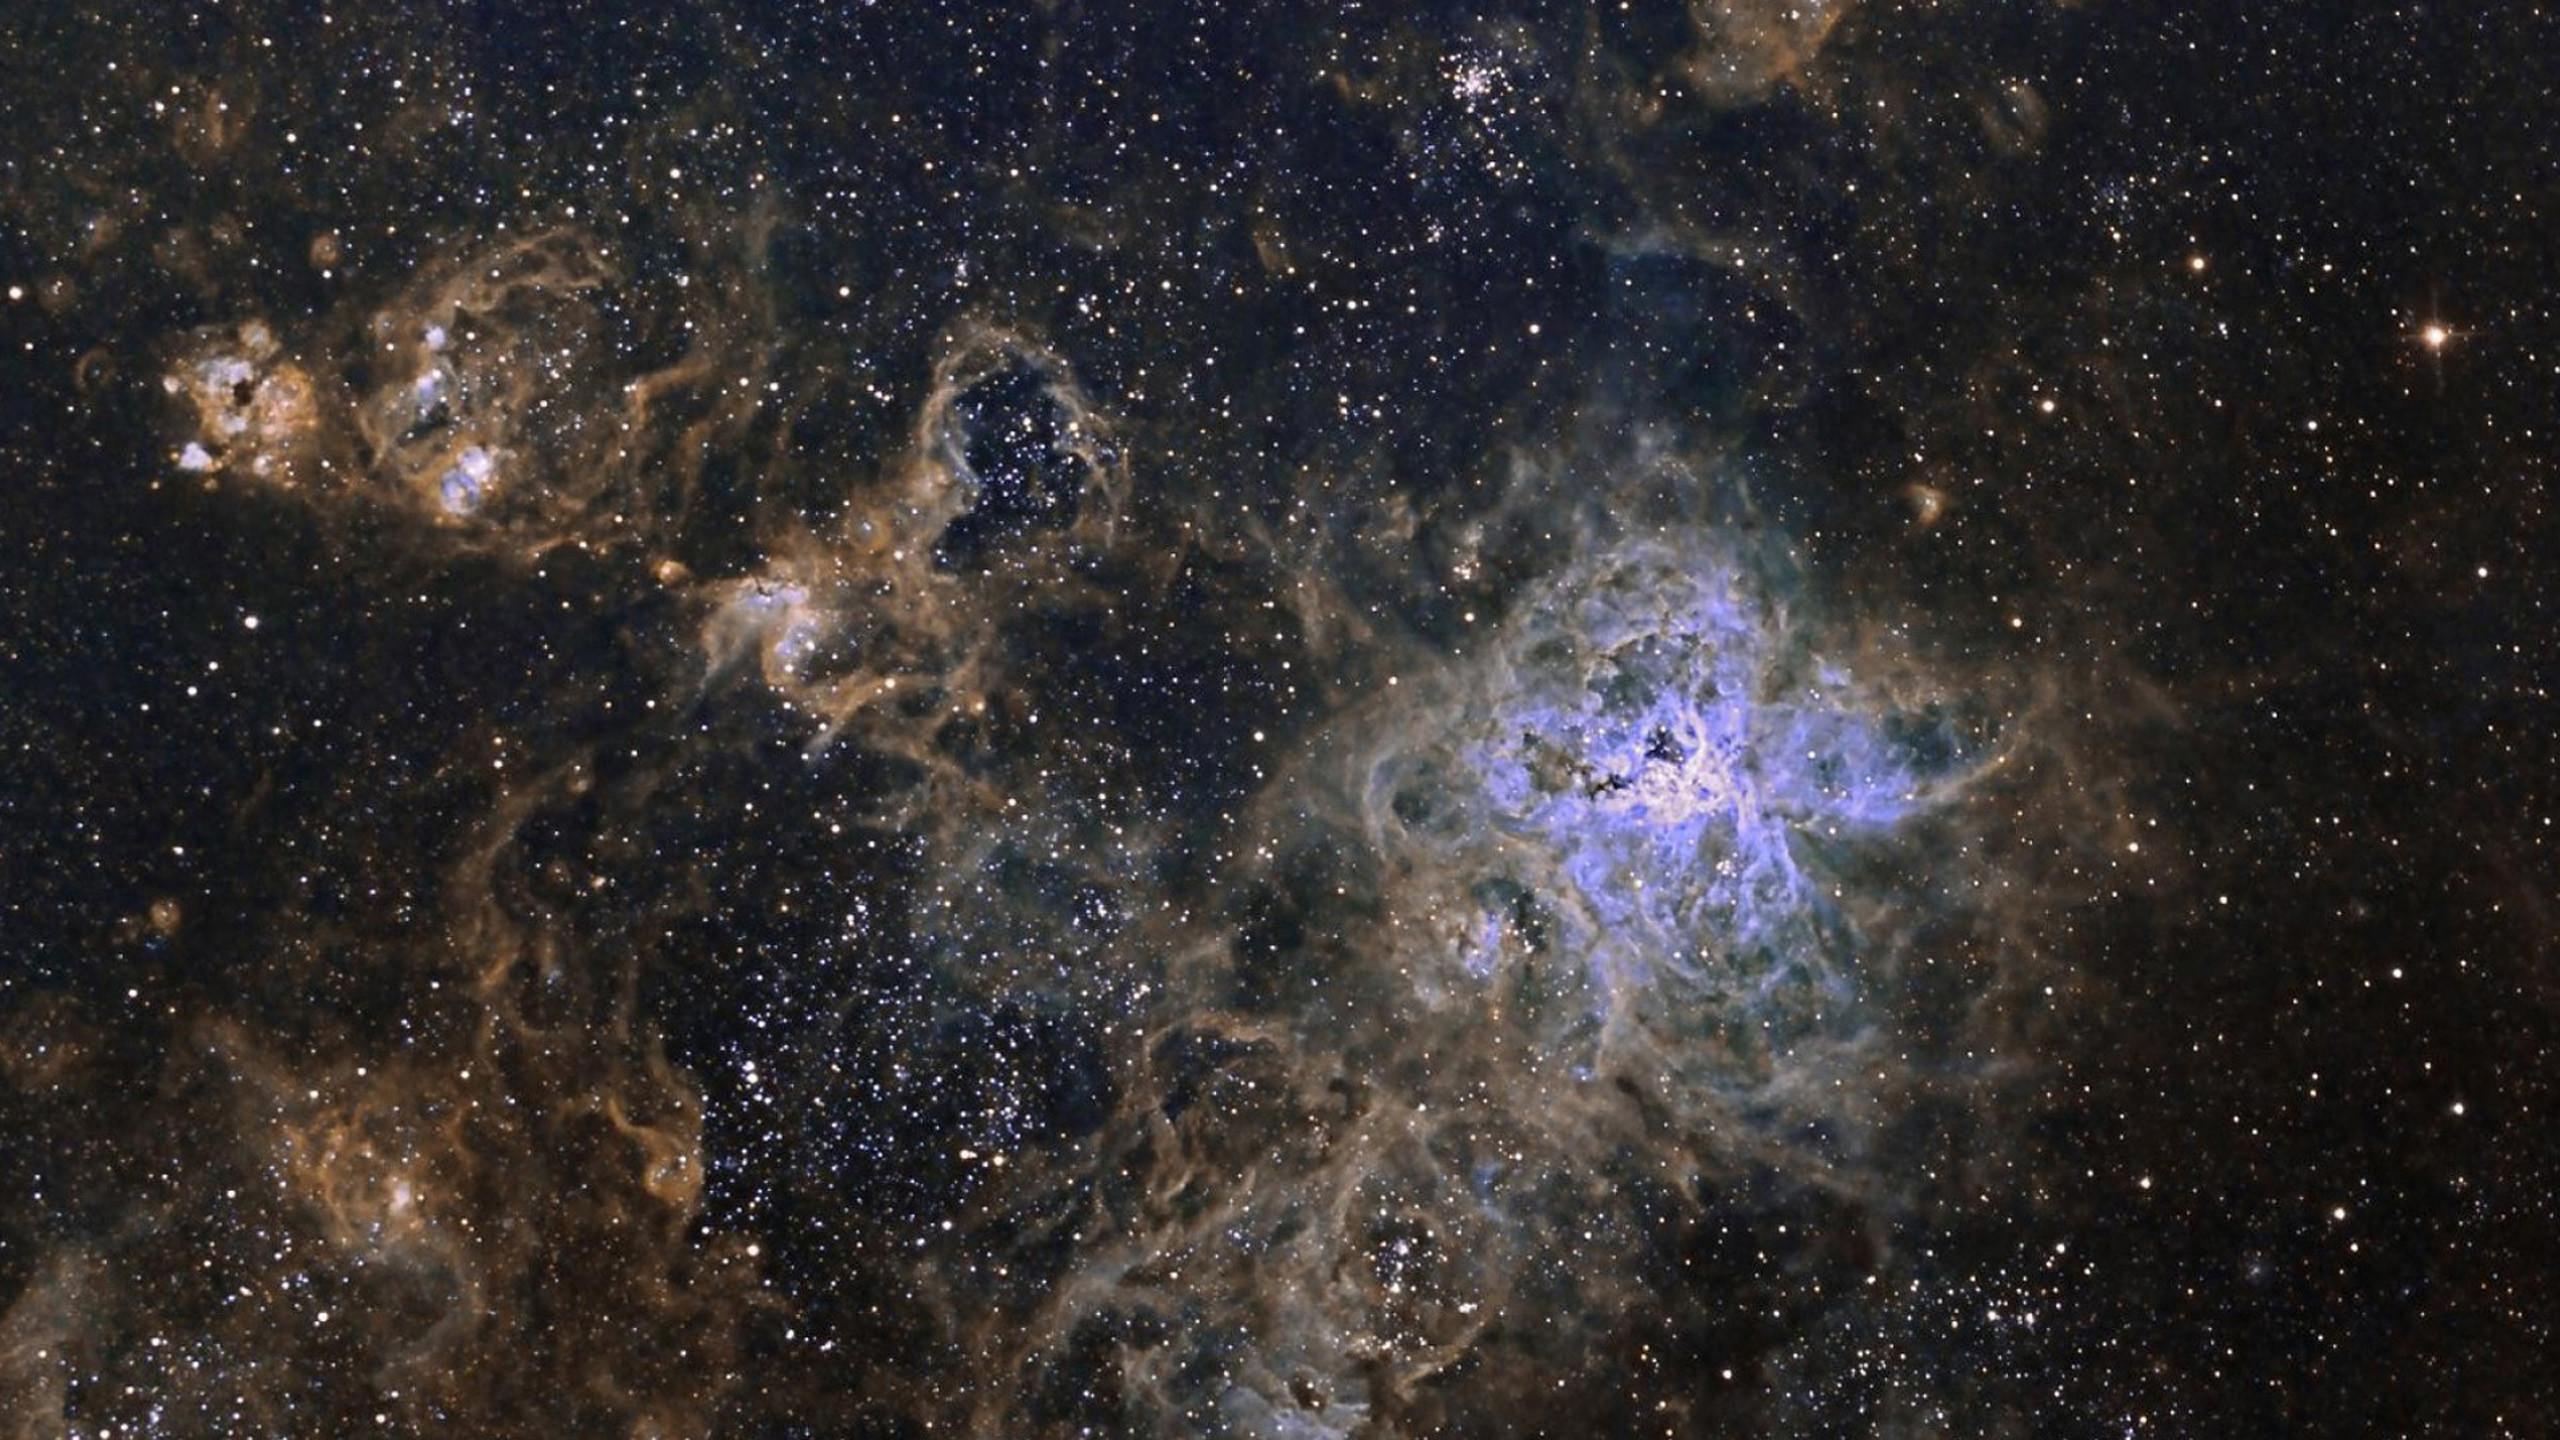 Hubble ultra deep field wallpaper 55 images - Hubble space images wallpaper ...